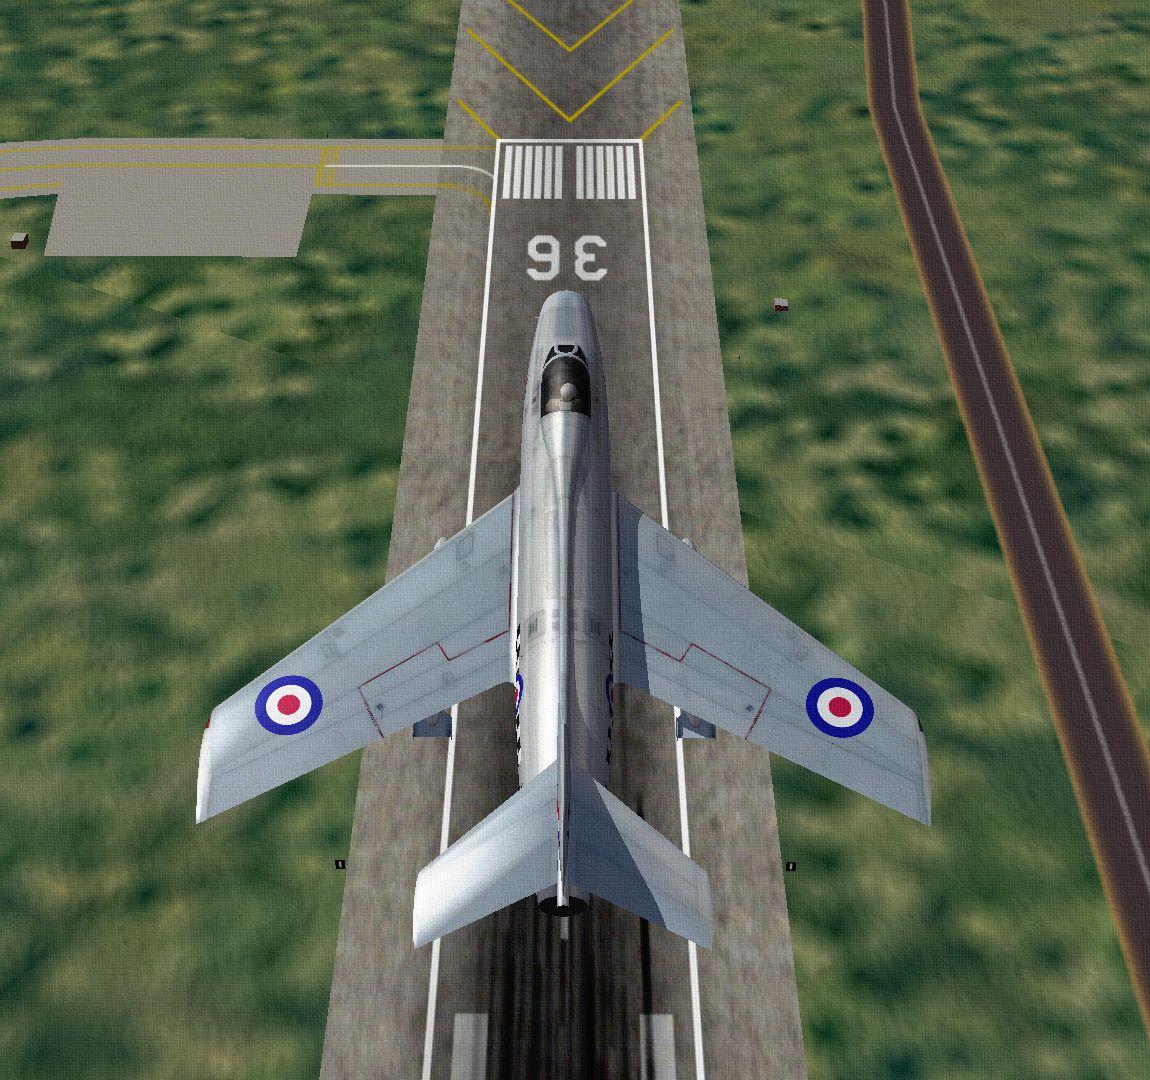 RAF%20SISKIN%20F1.11_zpsspnal6d8.jpg